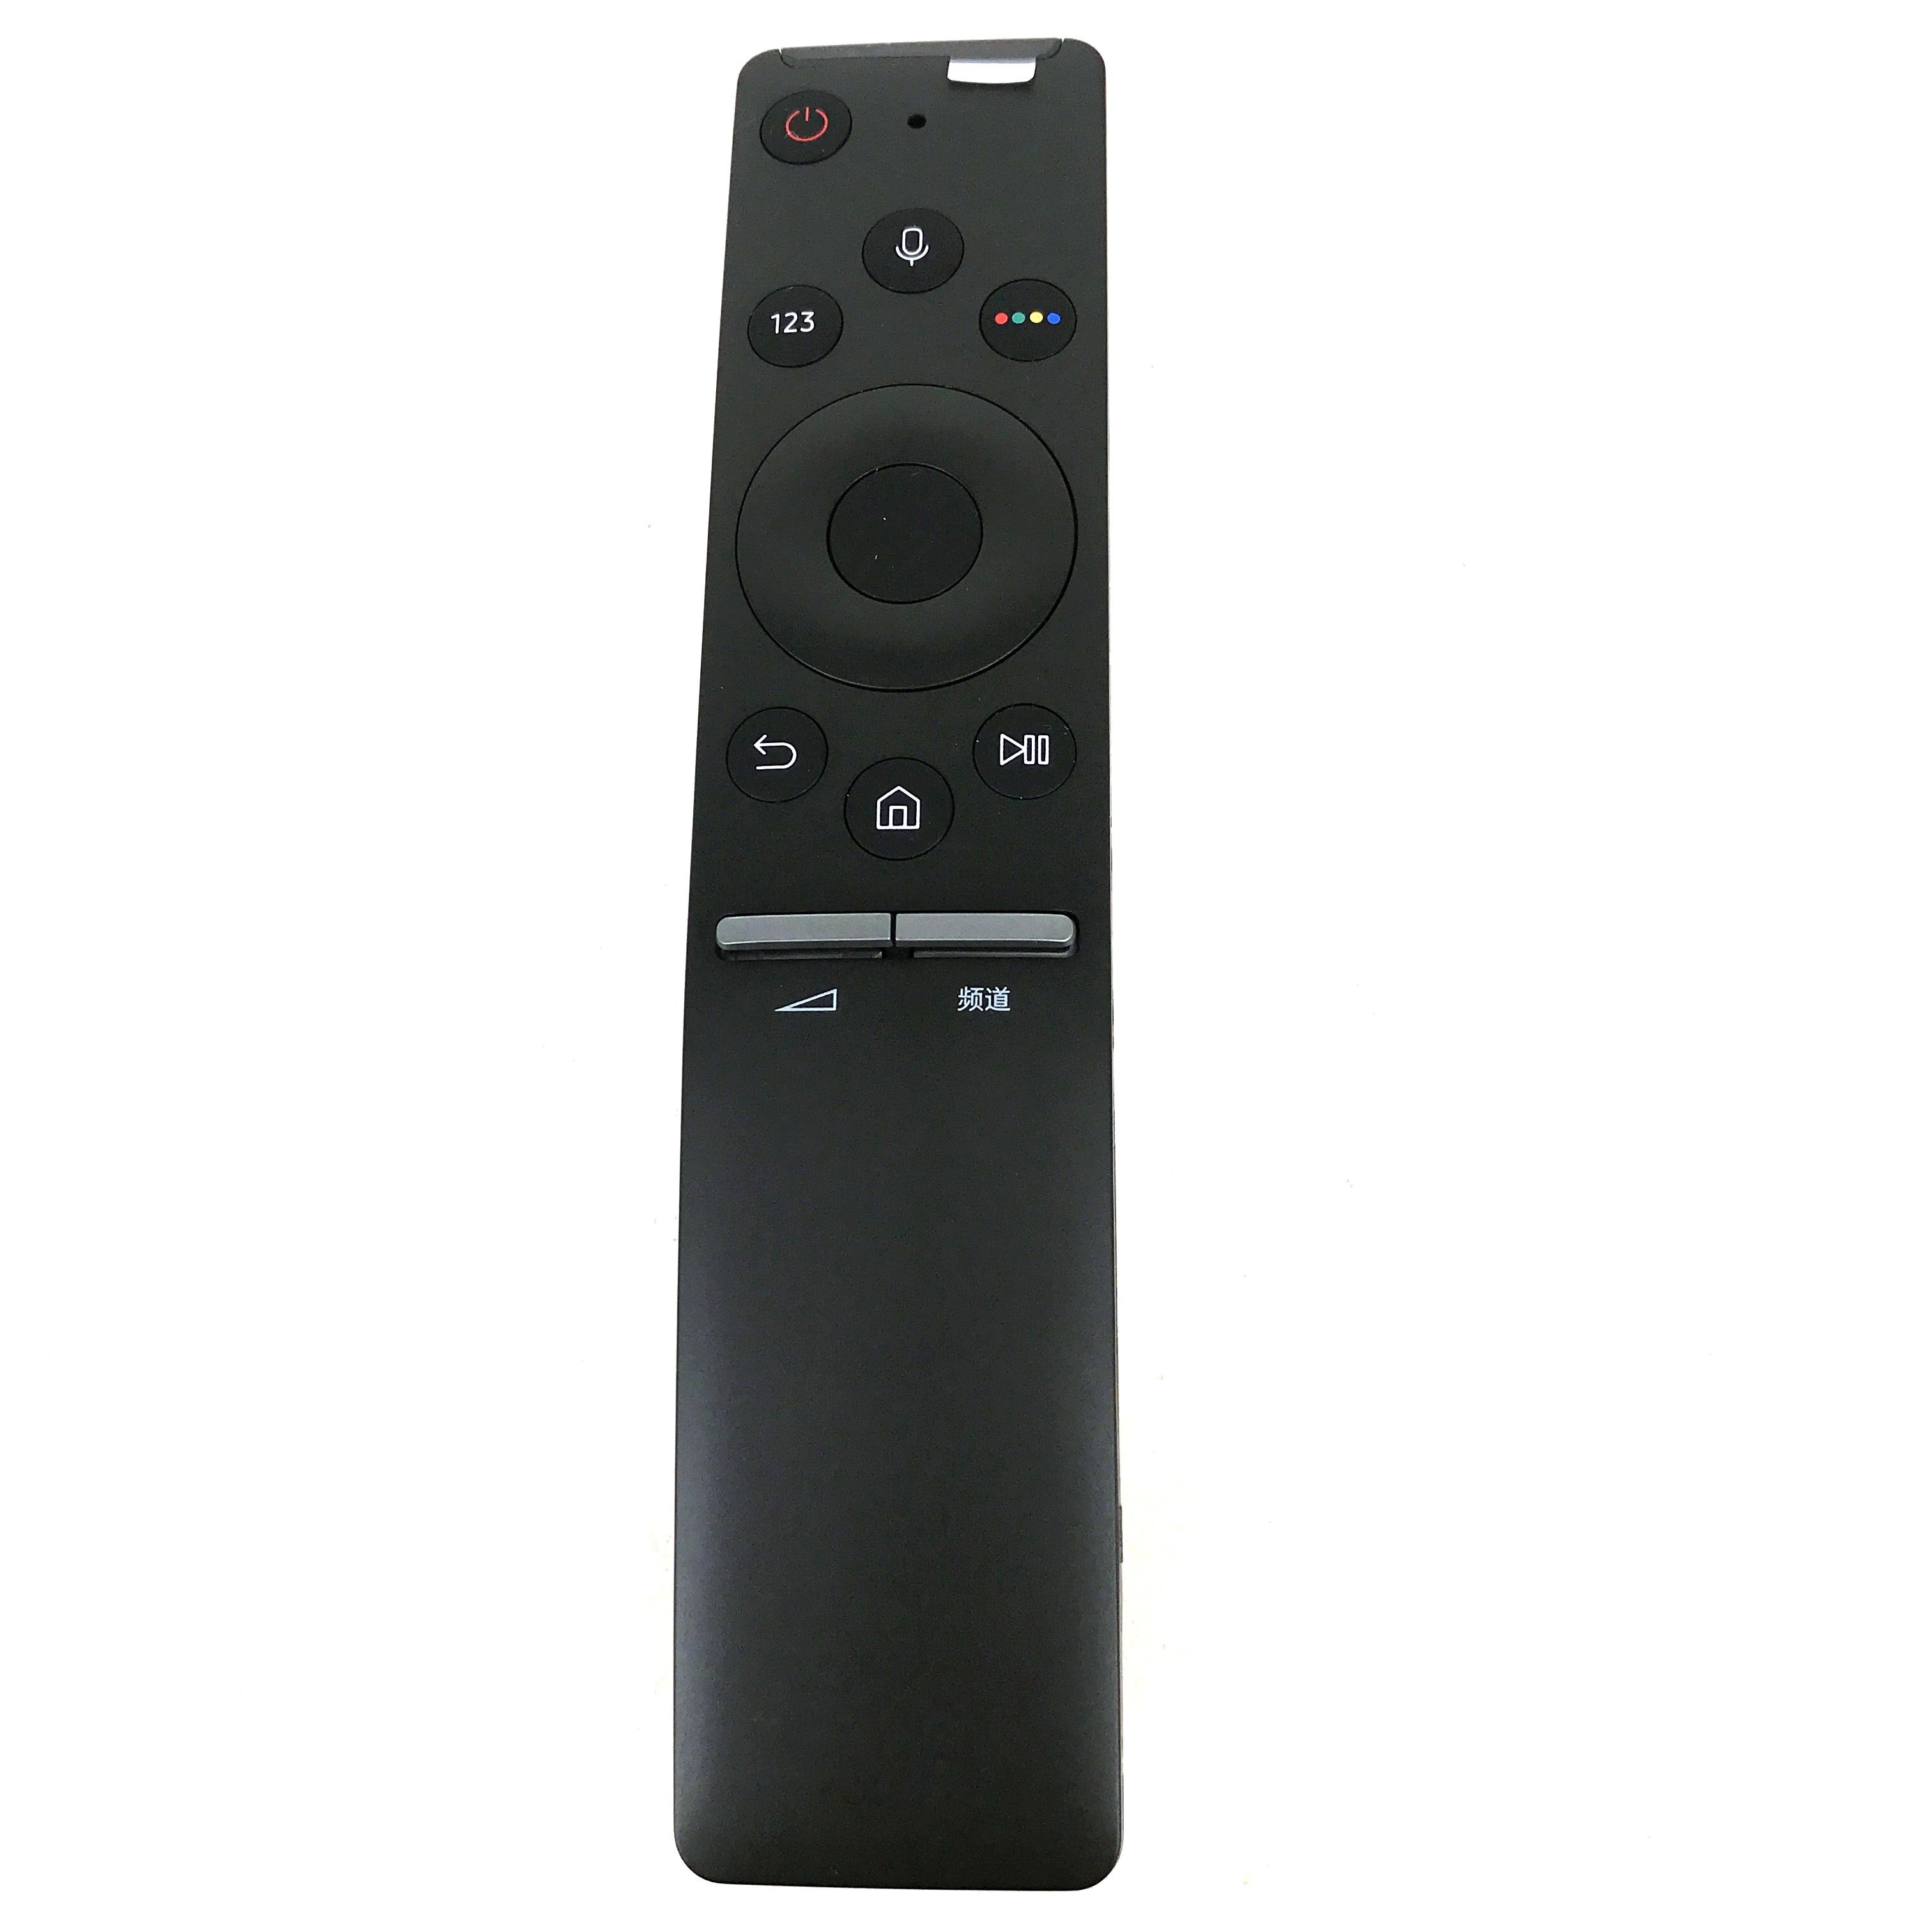 Nuevo Original BN59-01298C para Samsung Smart LCD LED 4K HDTV con control remoto con voz BN59-01298D BN59-01298A